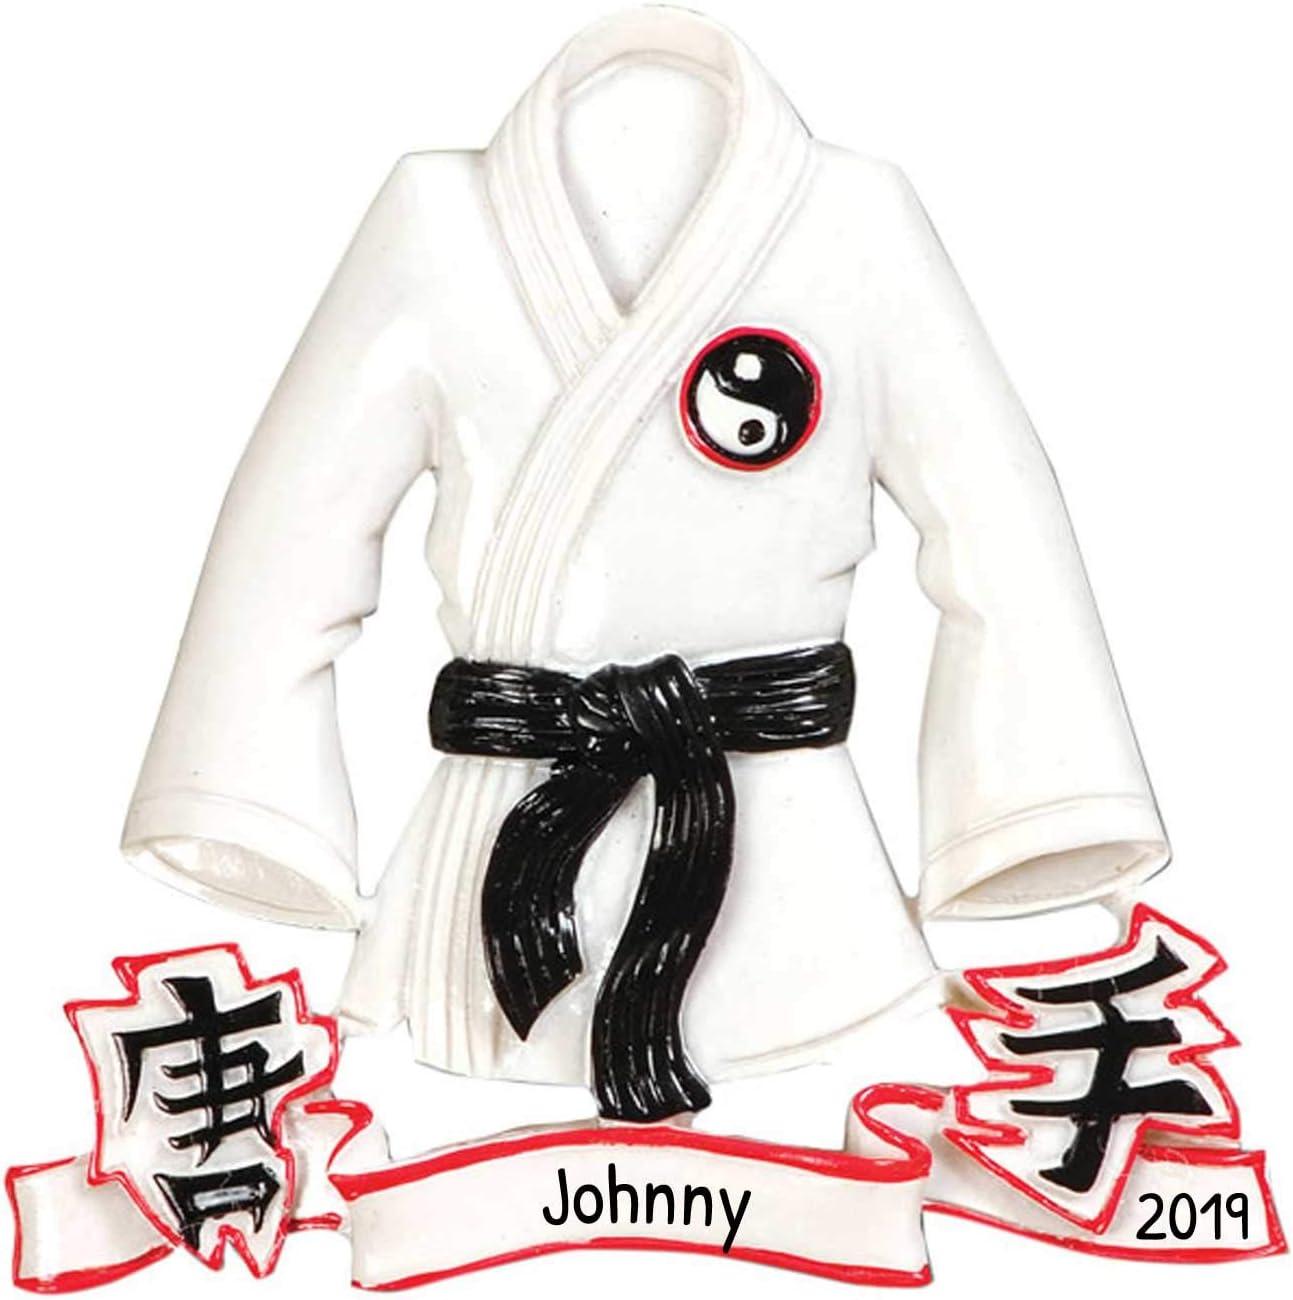 Personalized Karate Jacket Christmas Tree Ornament 2019 Martial Art Athlete Belt Training Ying Yang Kick Hobby Child Chinese Kung Fu White Crane Grand-Kid Strike Gift Year Free Customization